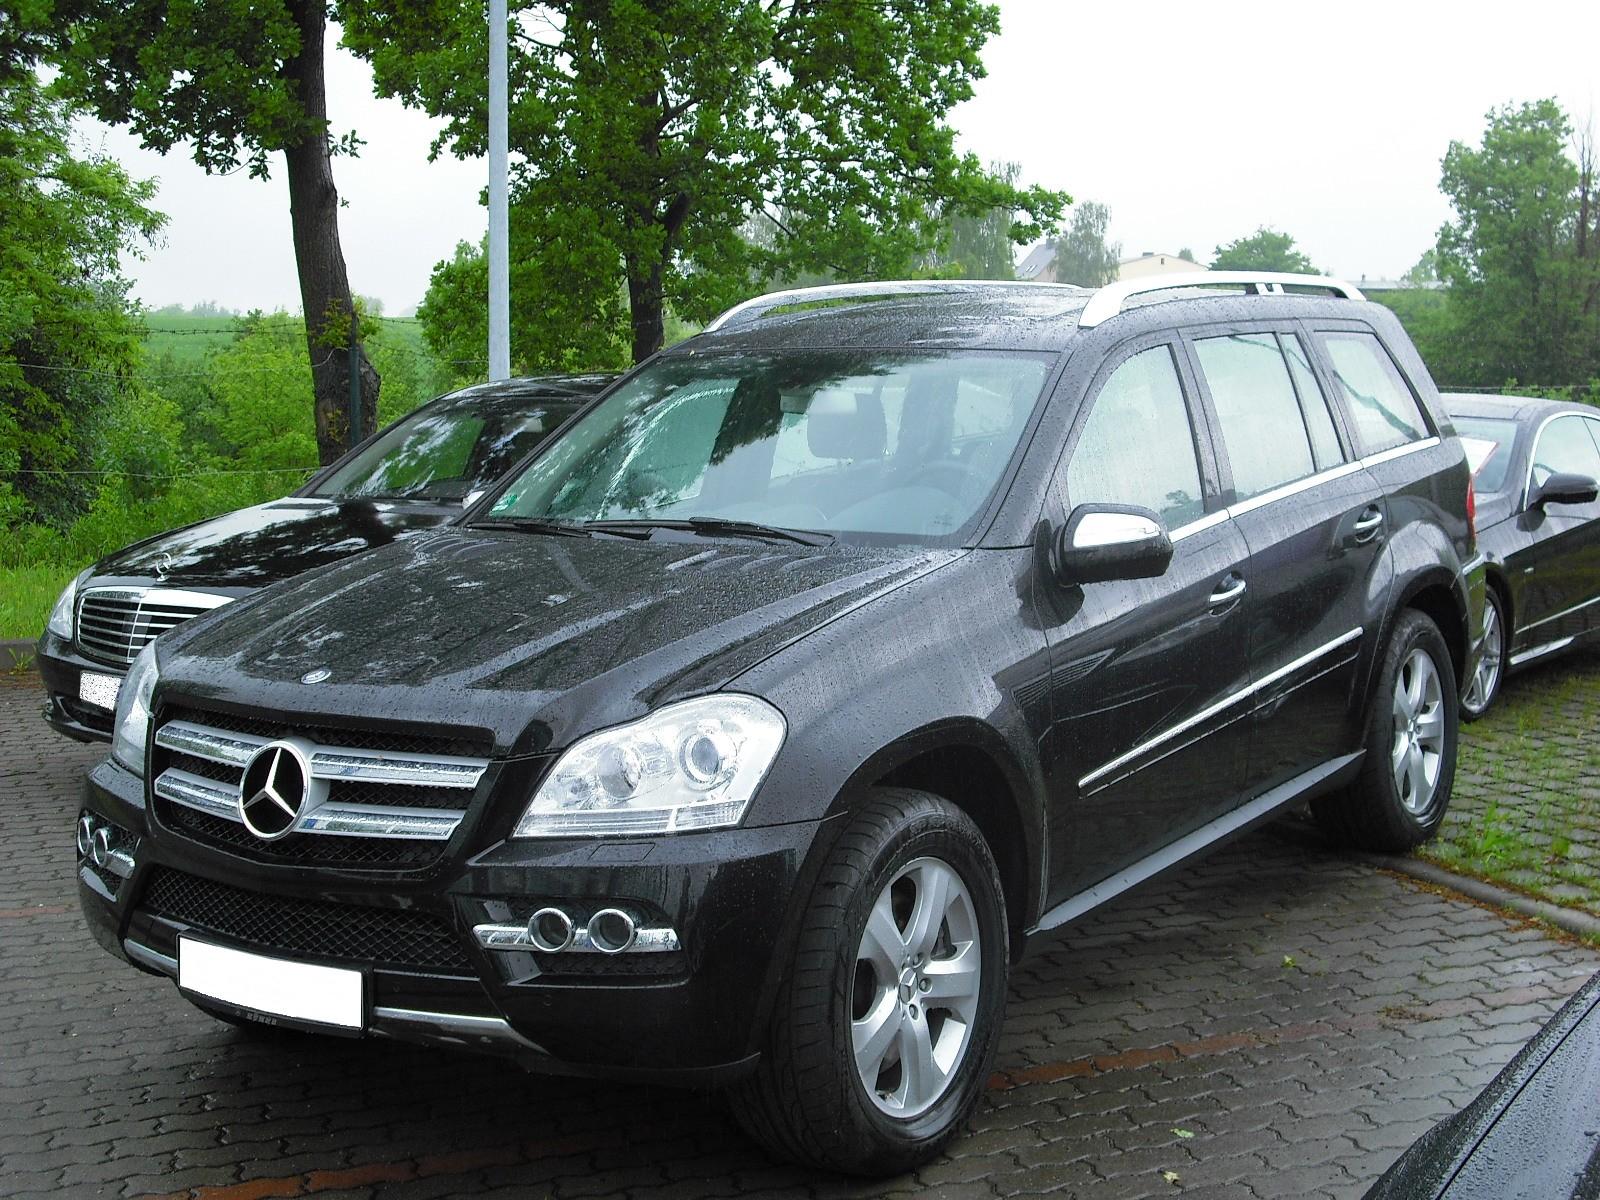 Mercedes benz gl 450 cdi photos reviews news specs for Mercedes benz gls 450 review